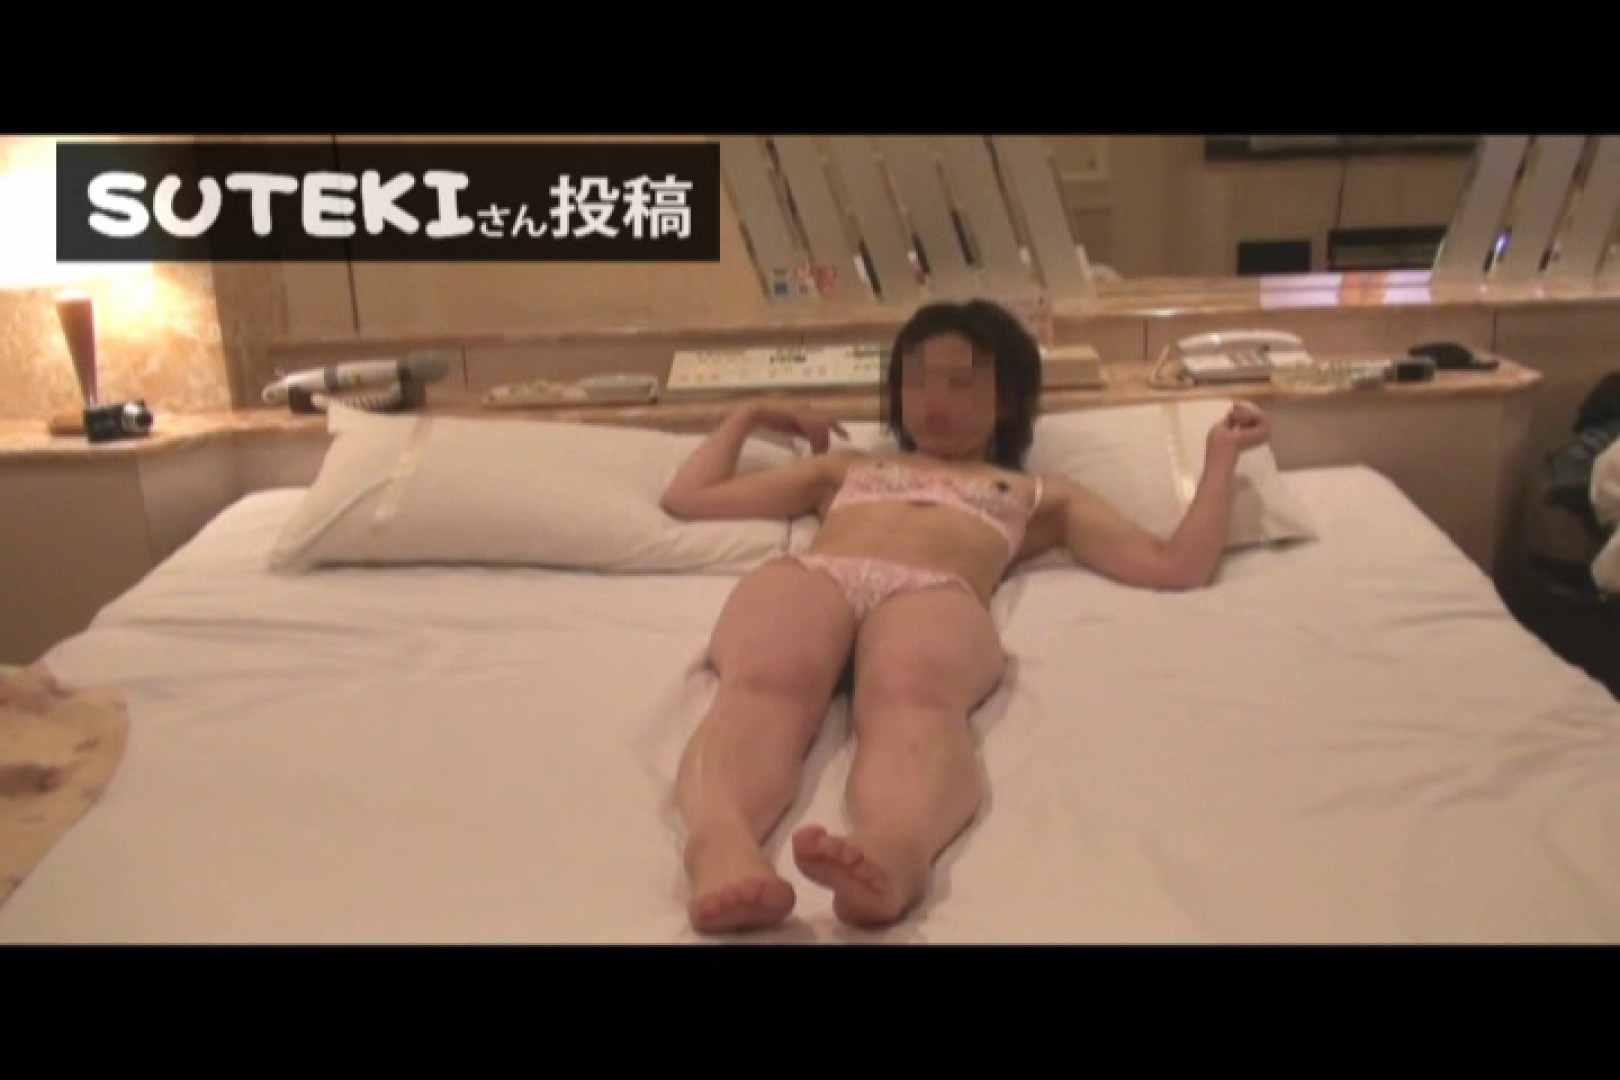 SUTEKIさん投稿 Hな記録、ピンクオープンブラ 素人  76pic 14